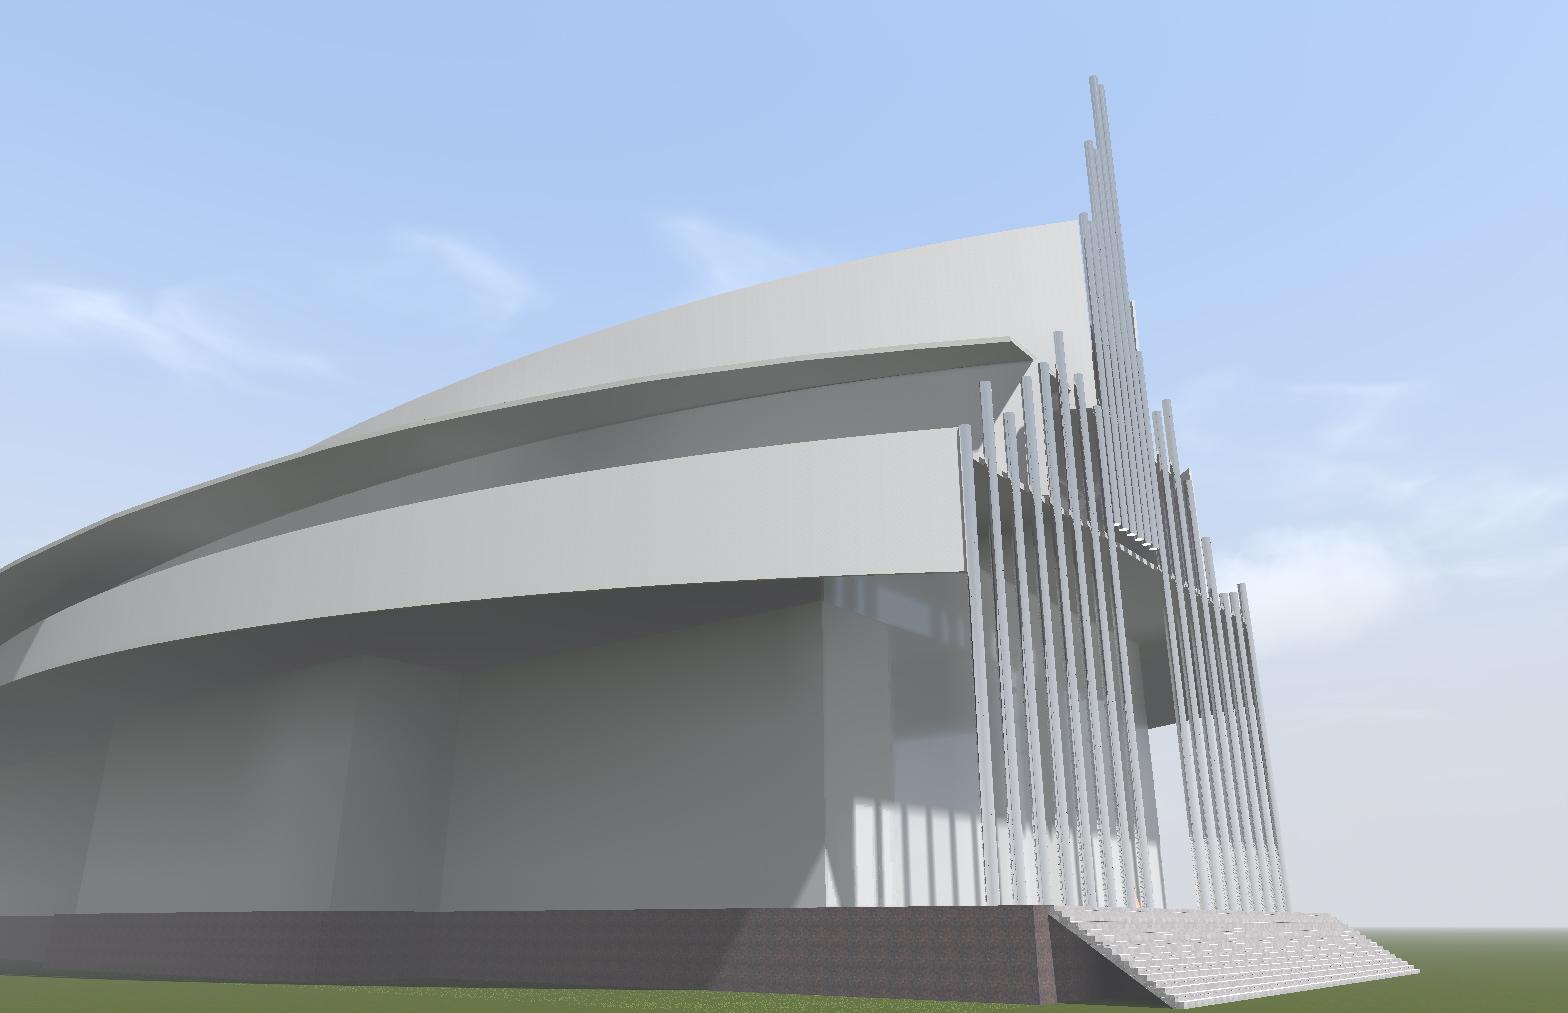 Разработка архитектурной концепции театра оперы и балета фото f_69552f47679c8bd5.jpg